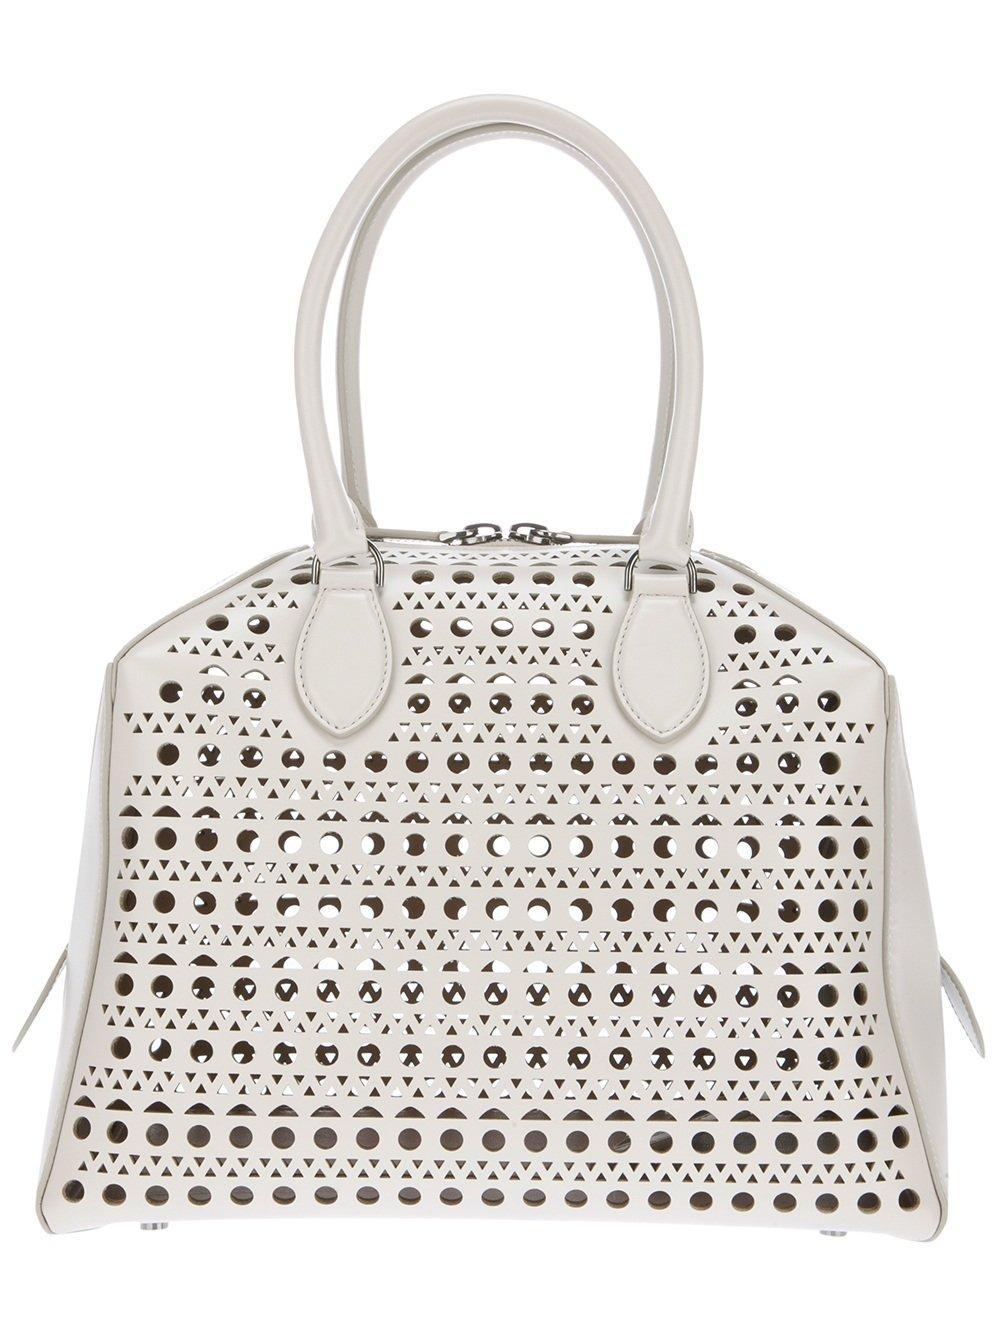 Elle Macpherson with Azzedine Alaia bag | HANDBAGS IN THE ...